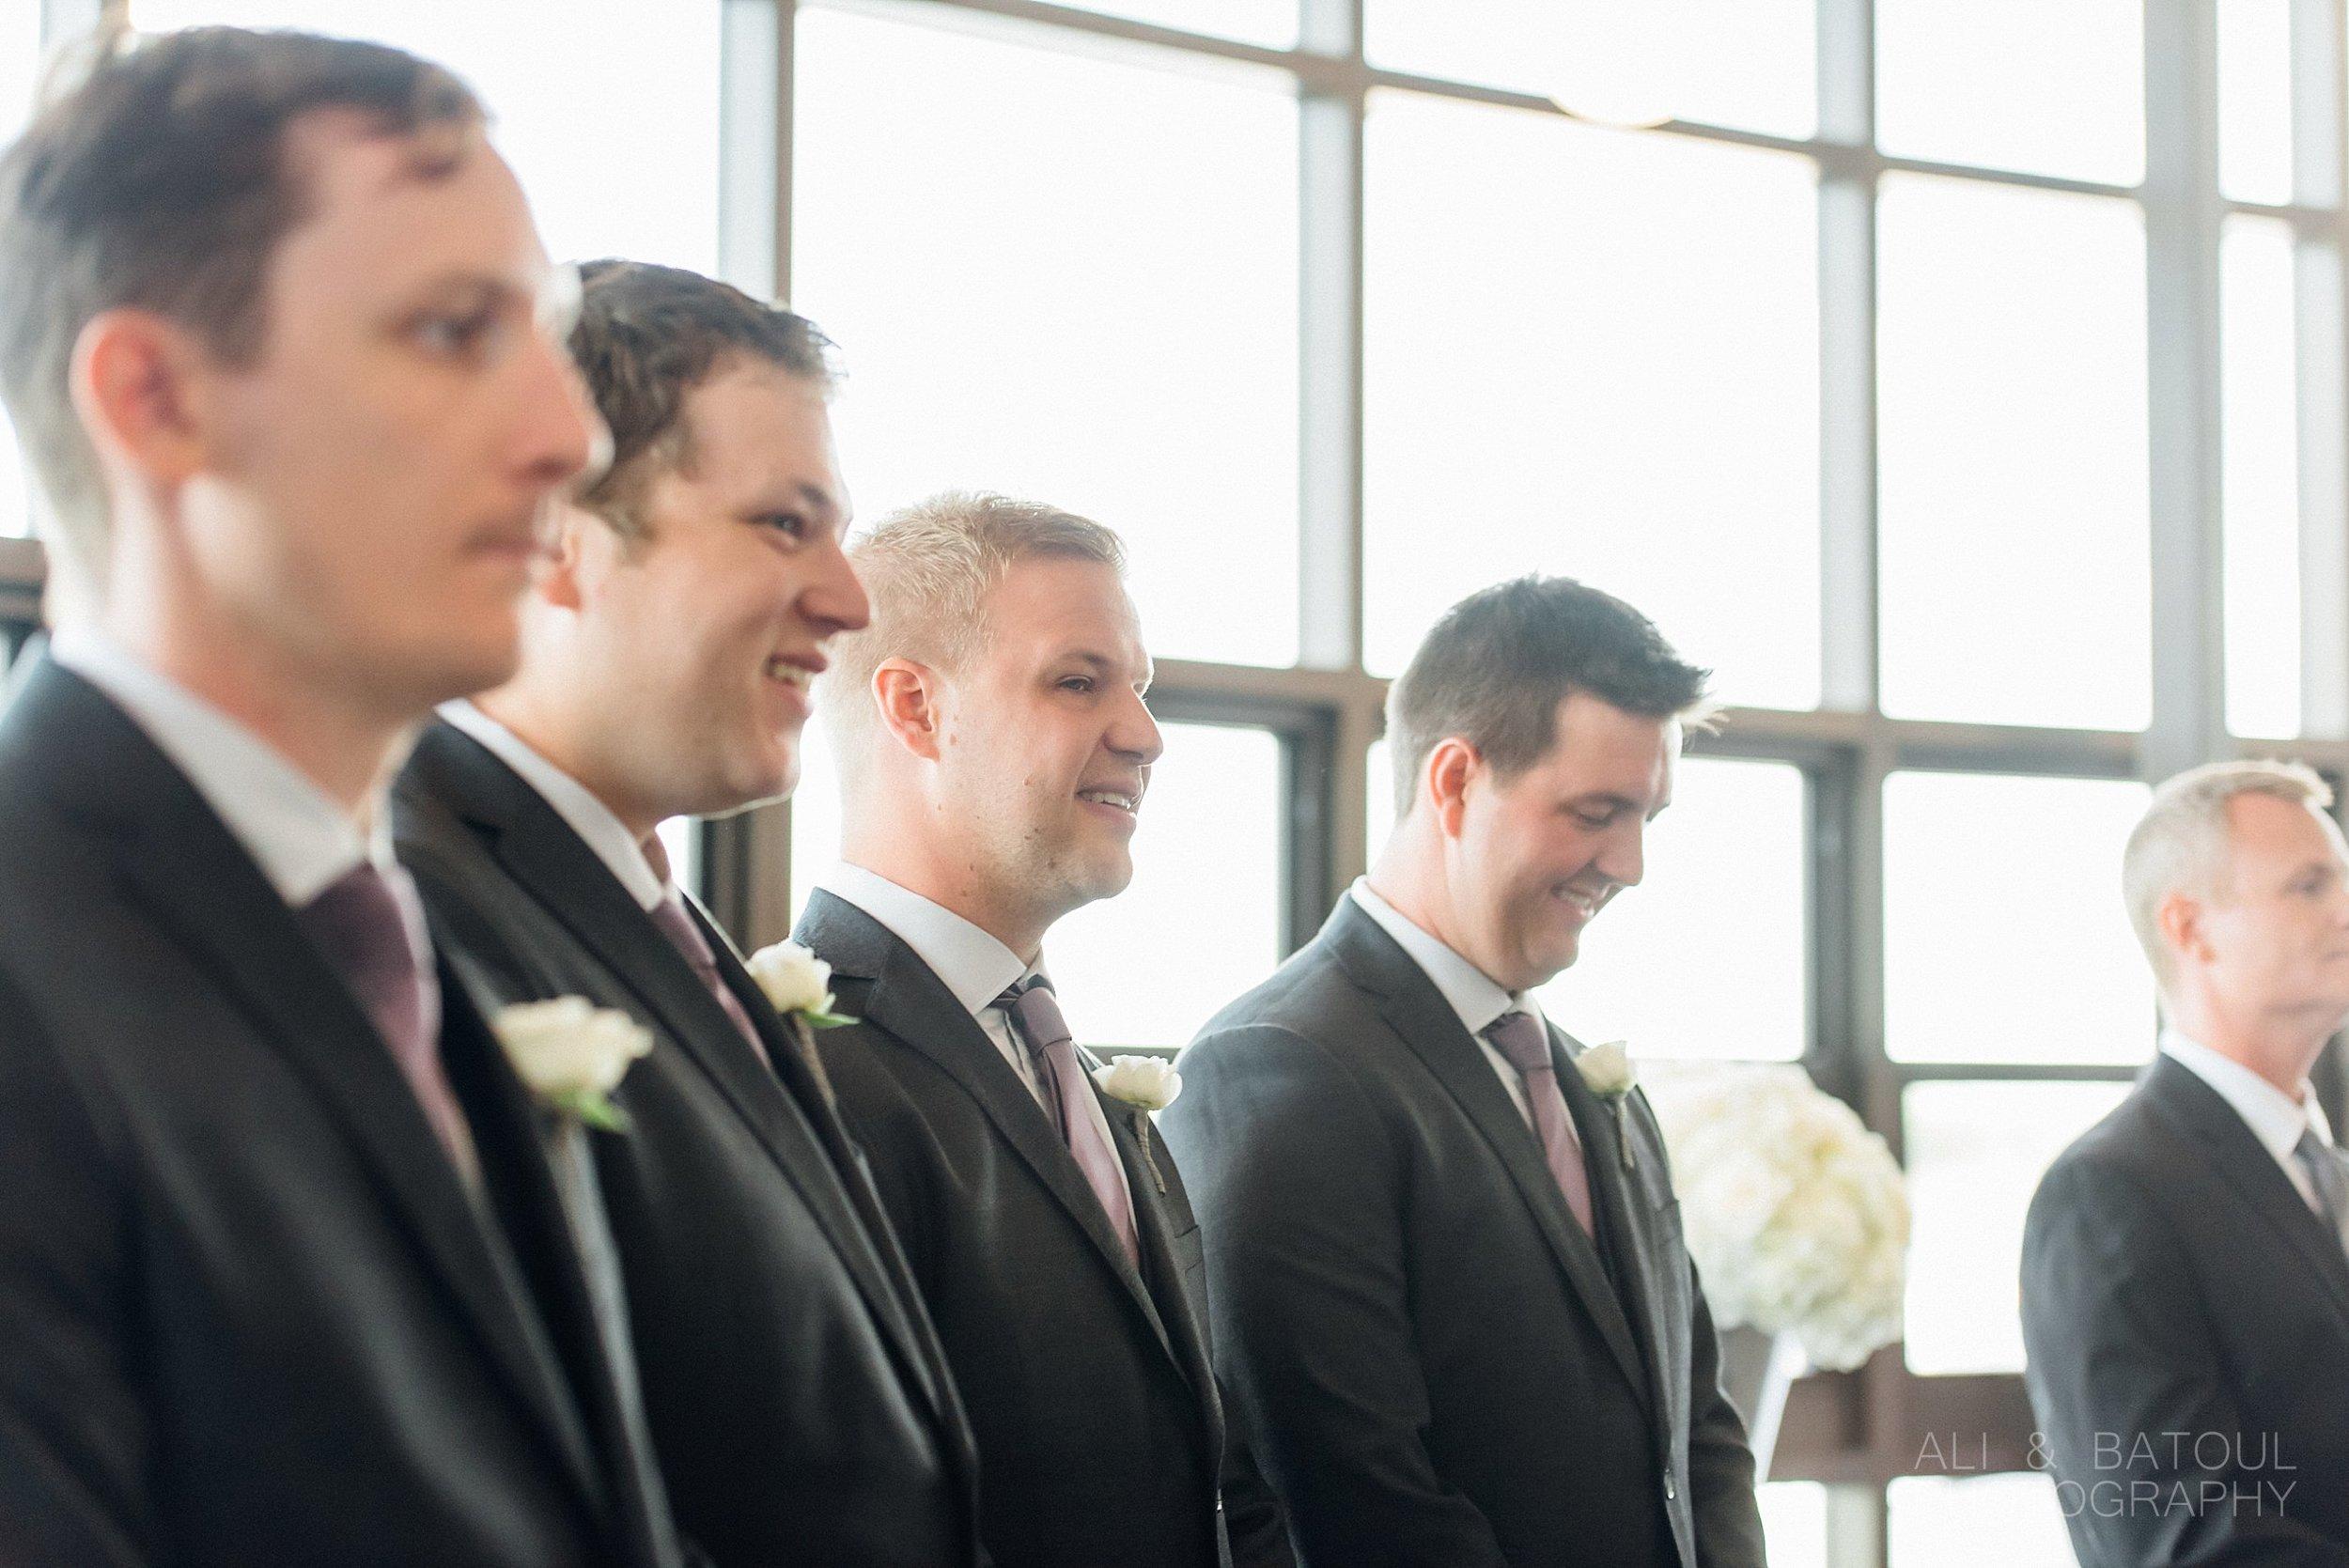 Ali & Batoul Photography - Documentary Fine Art Ottawa Wedding Photography_0023.jpg